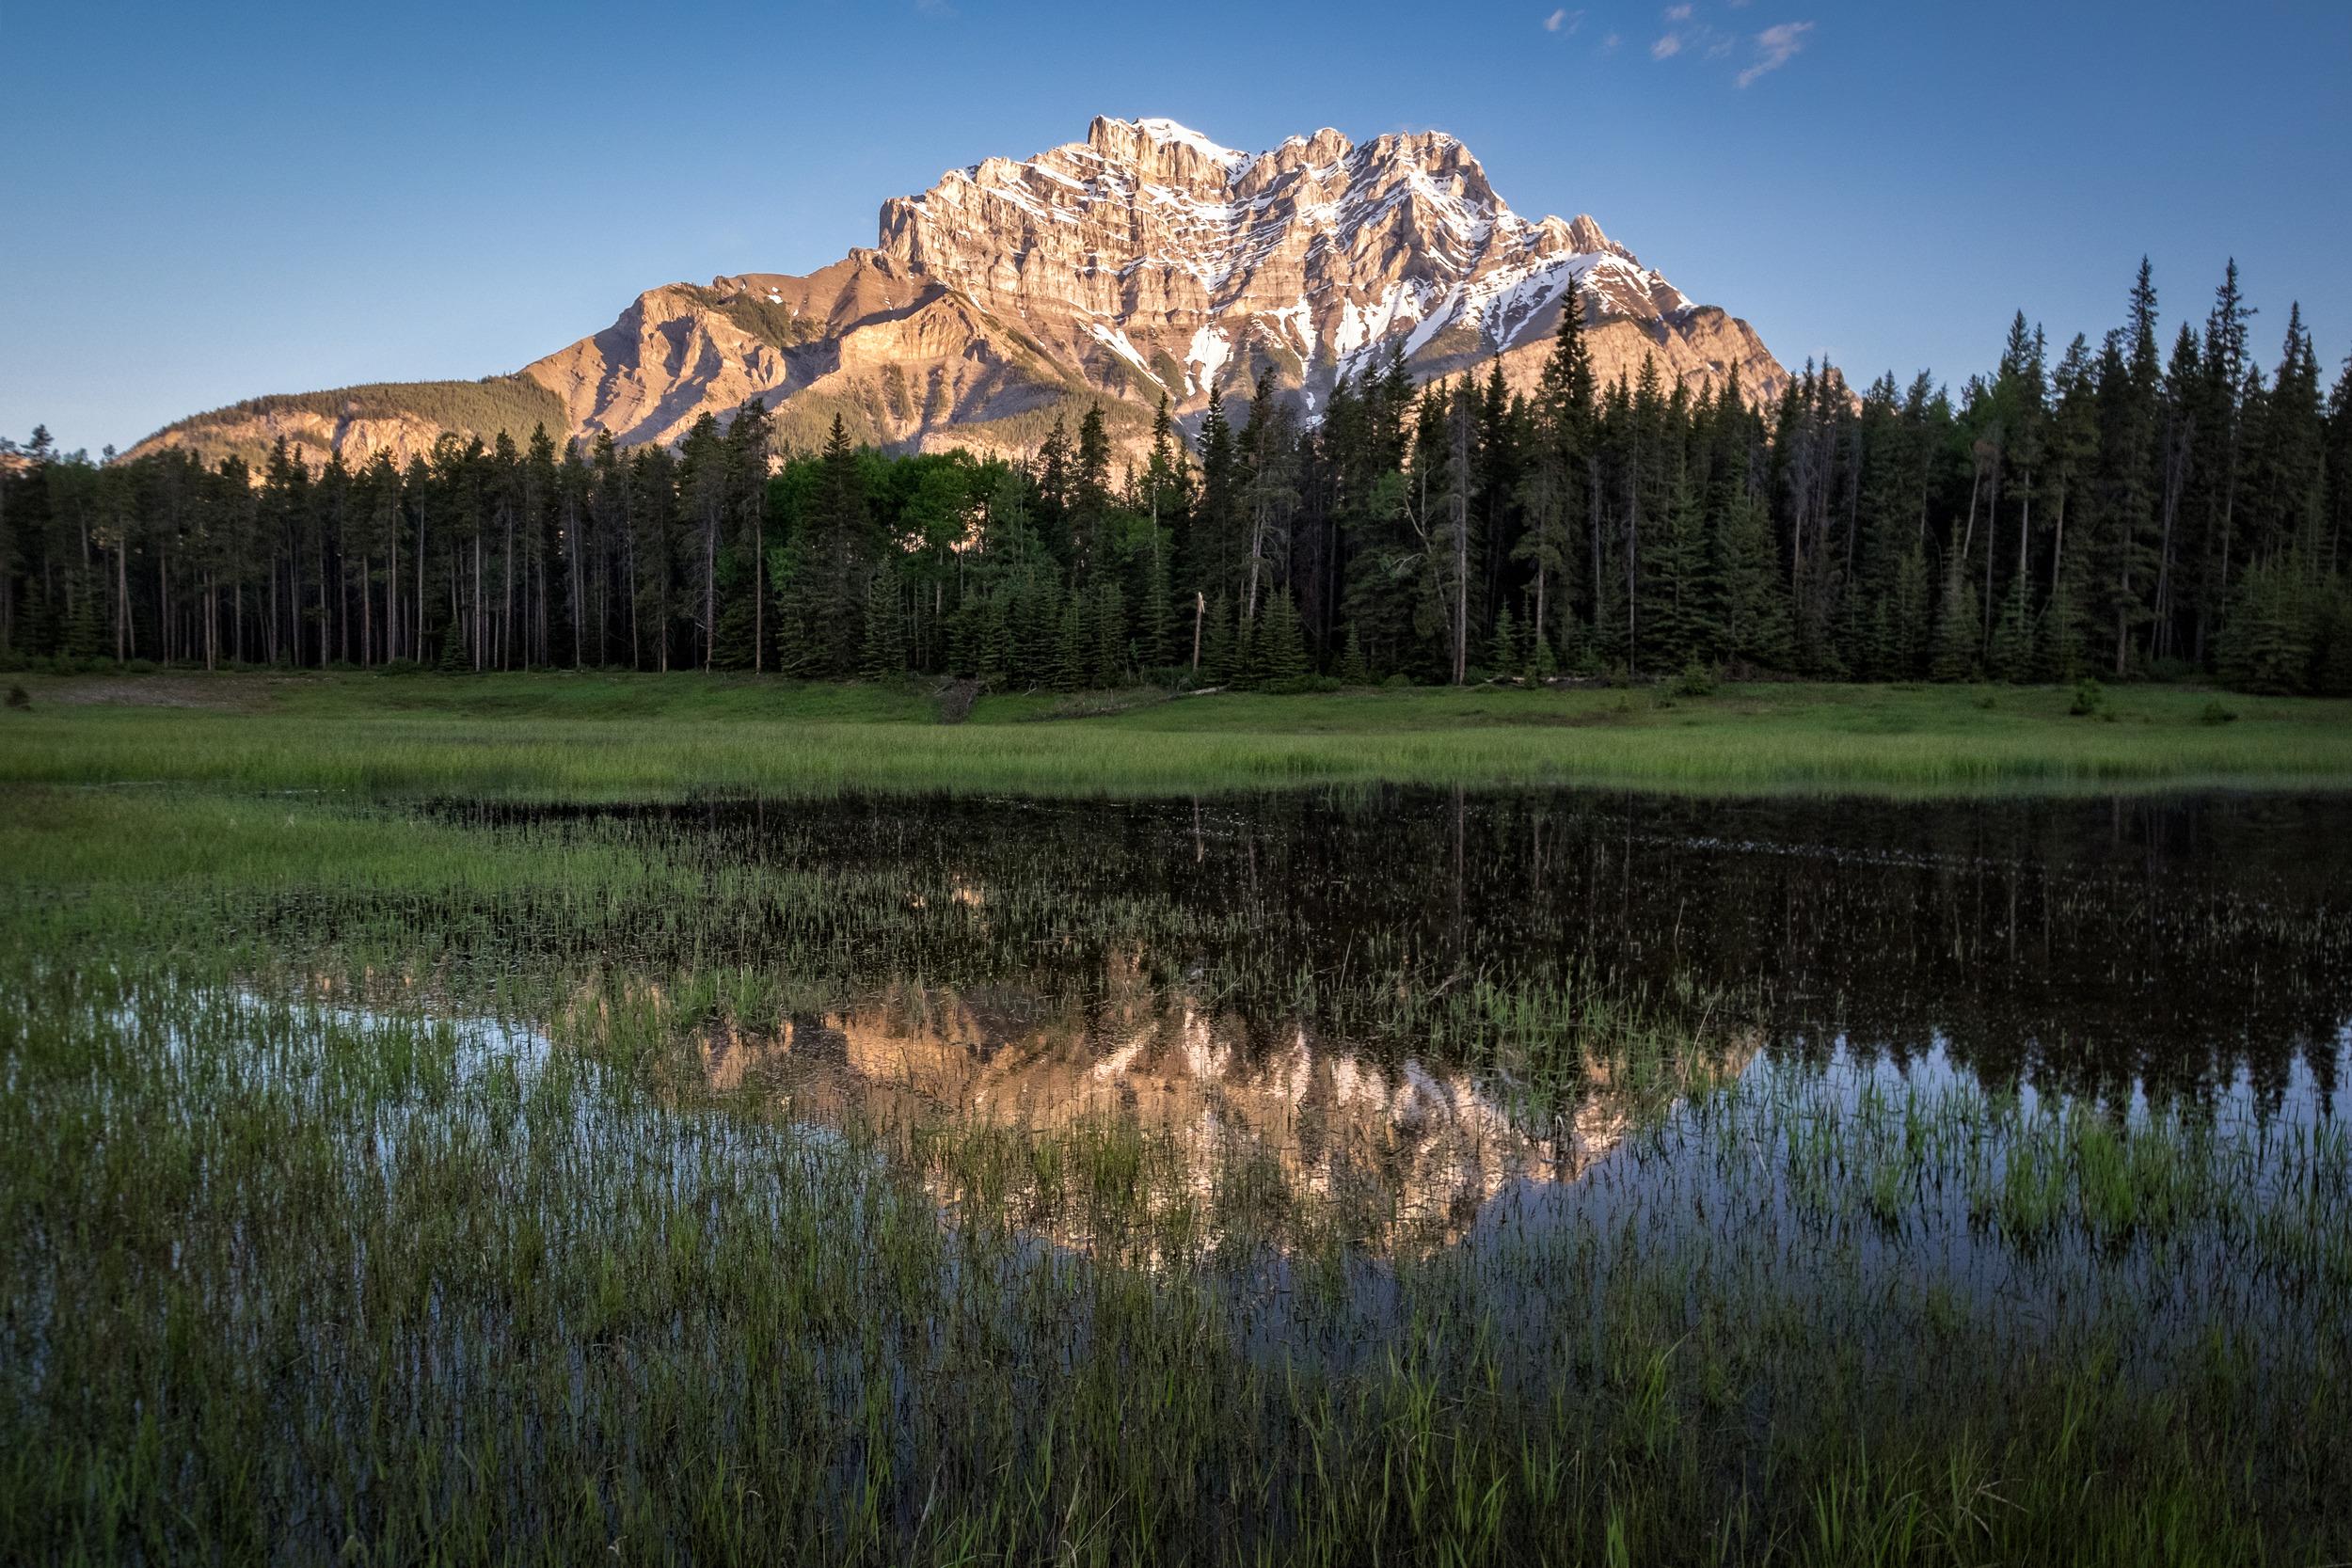 Mount Norquay, Banff National Park, Alberta